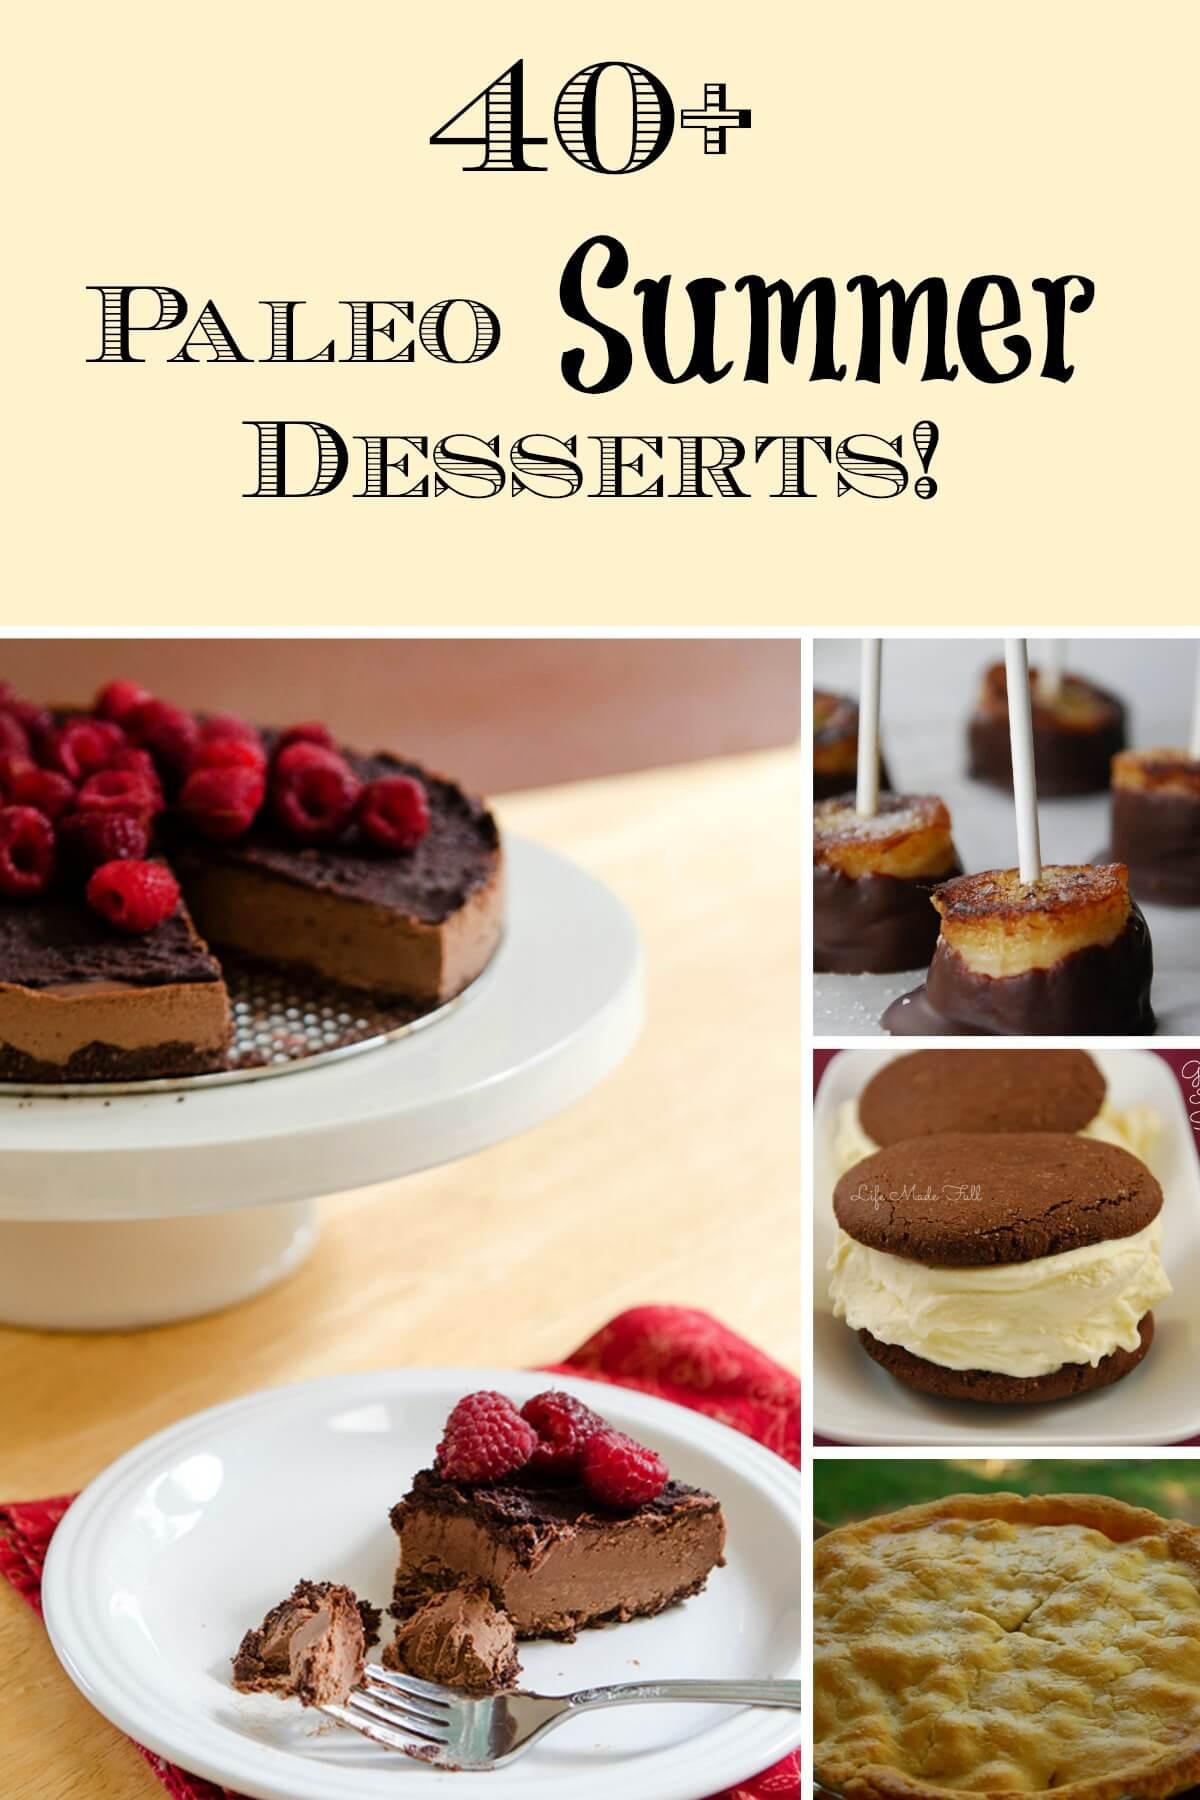 Paleo Summer Desserts the 20 Best Ideas for 40 Paleo Summer Desserts Life Made Full